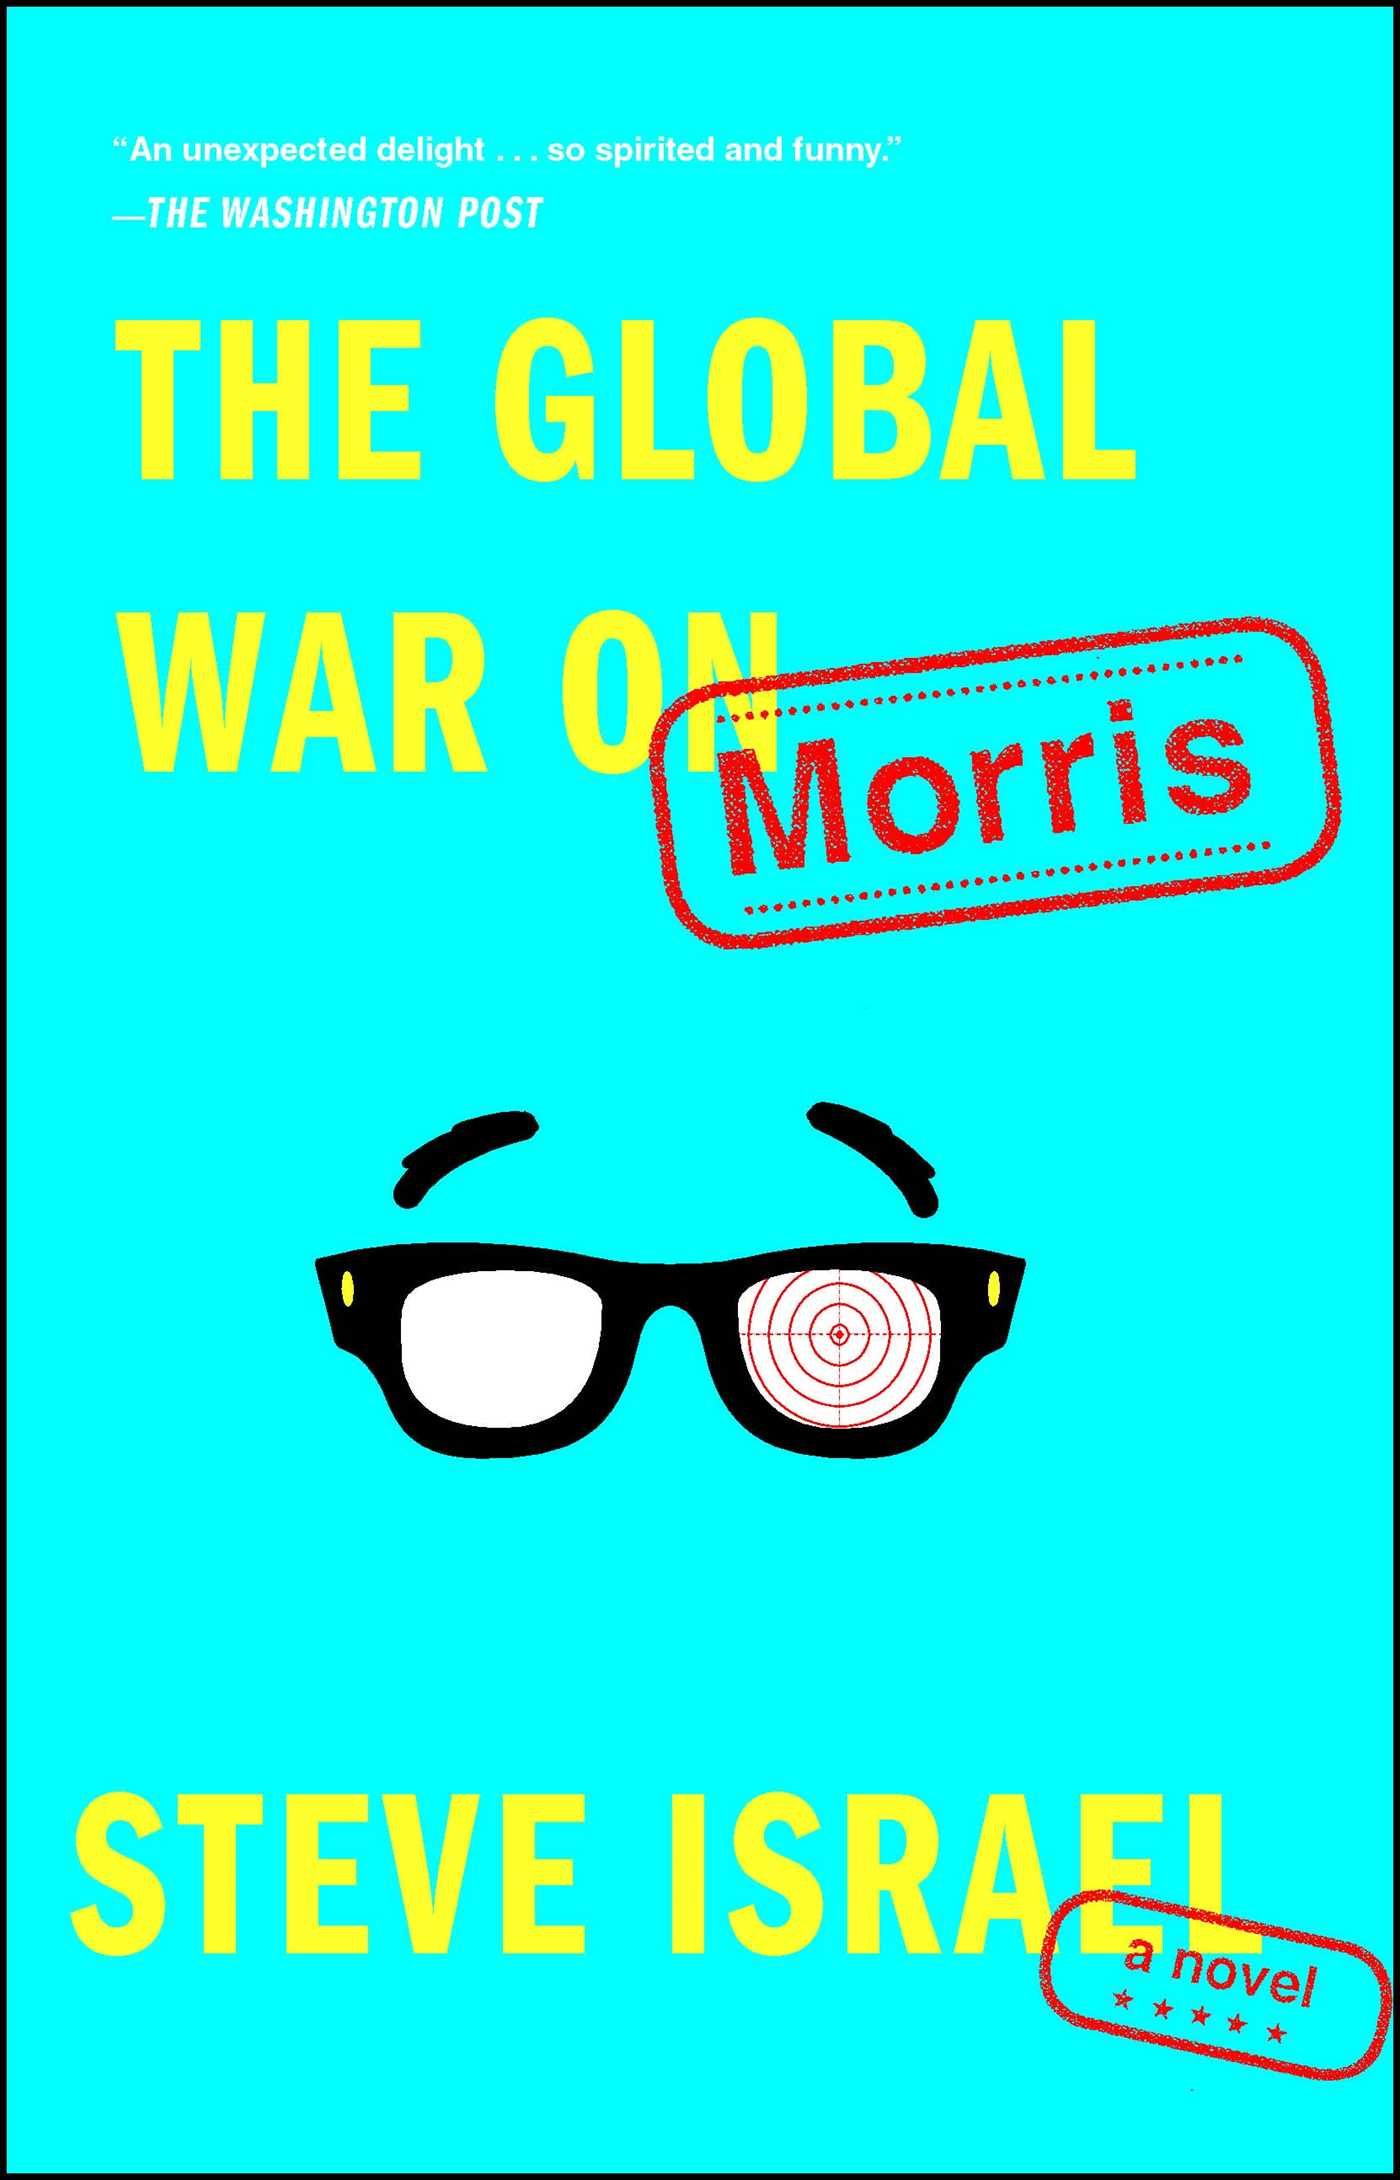 The global war on morris 9781476772240 hr